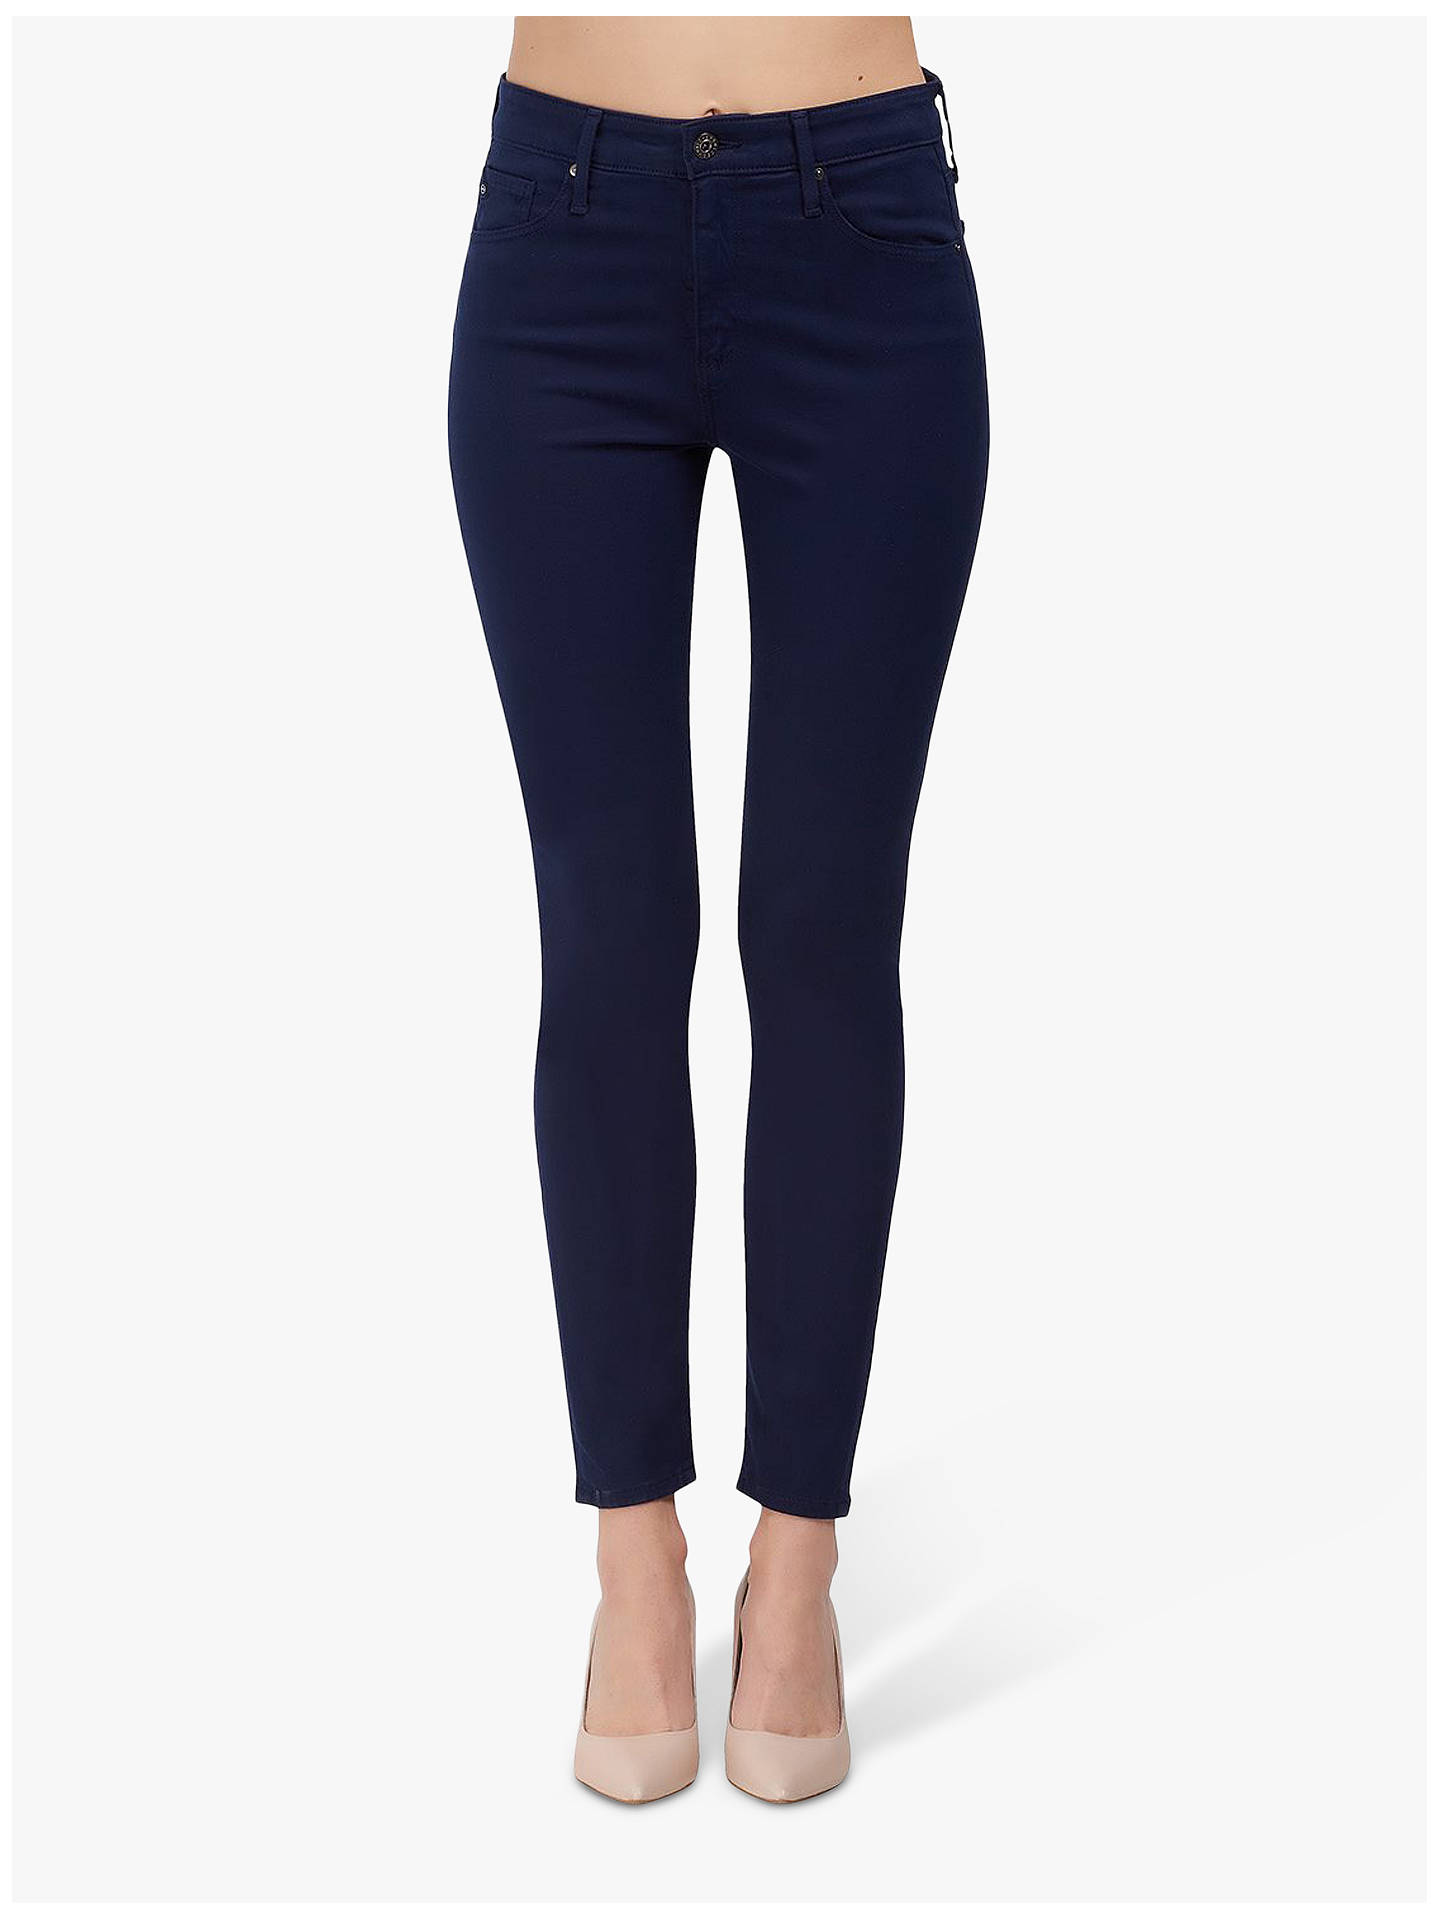 AG The Farrah Mid Rise Skinny Jeans, Indigo Ink at John